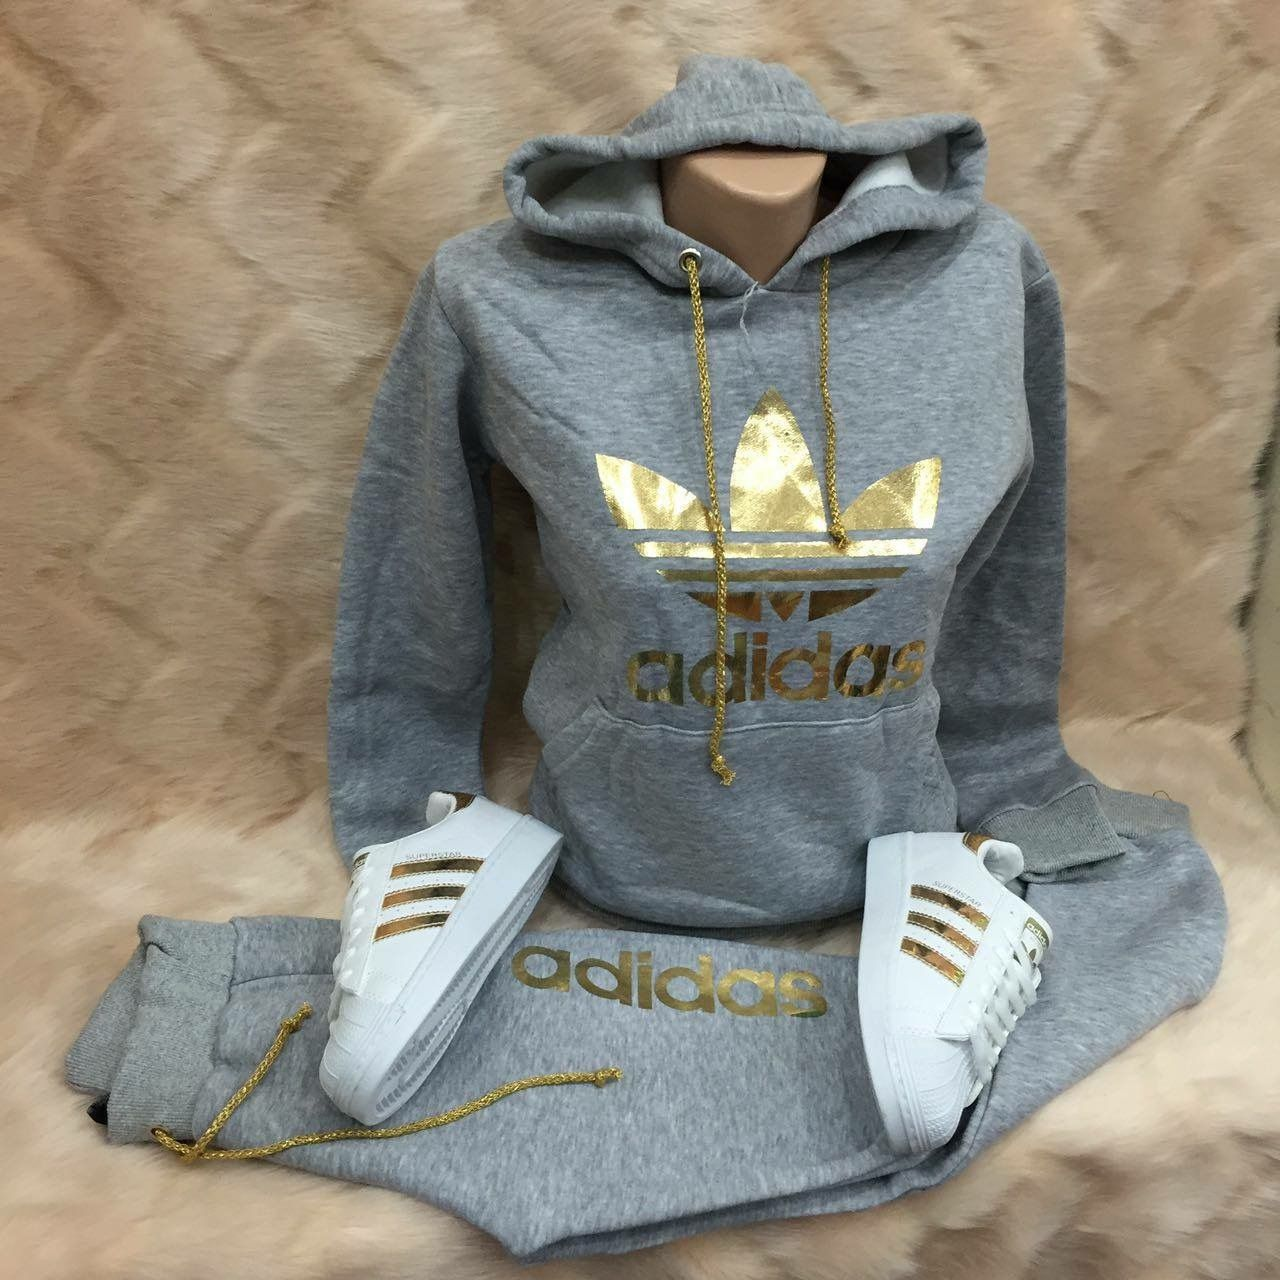 moletons femininos Adidas cinza com estampa | Roupas adidas